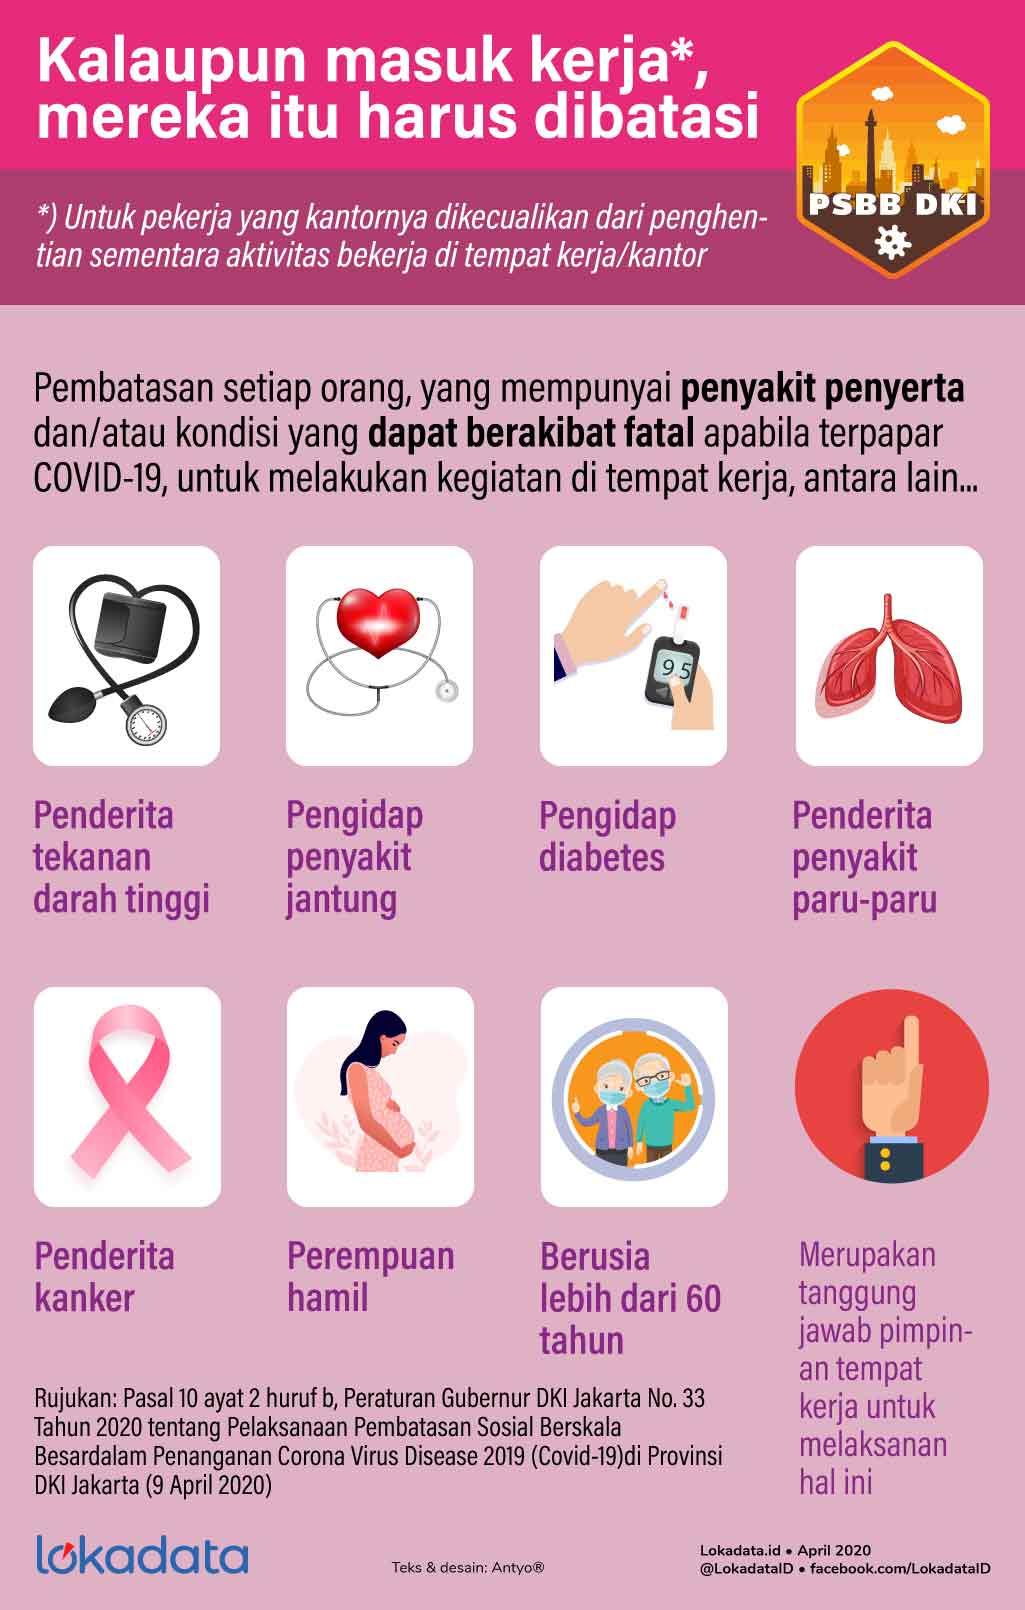 Daftar penyakit dan kondisi yang meningkatkan risiko Covid-19, vialokadata.id